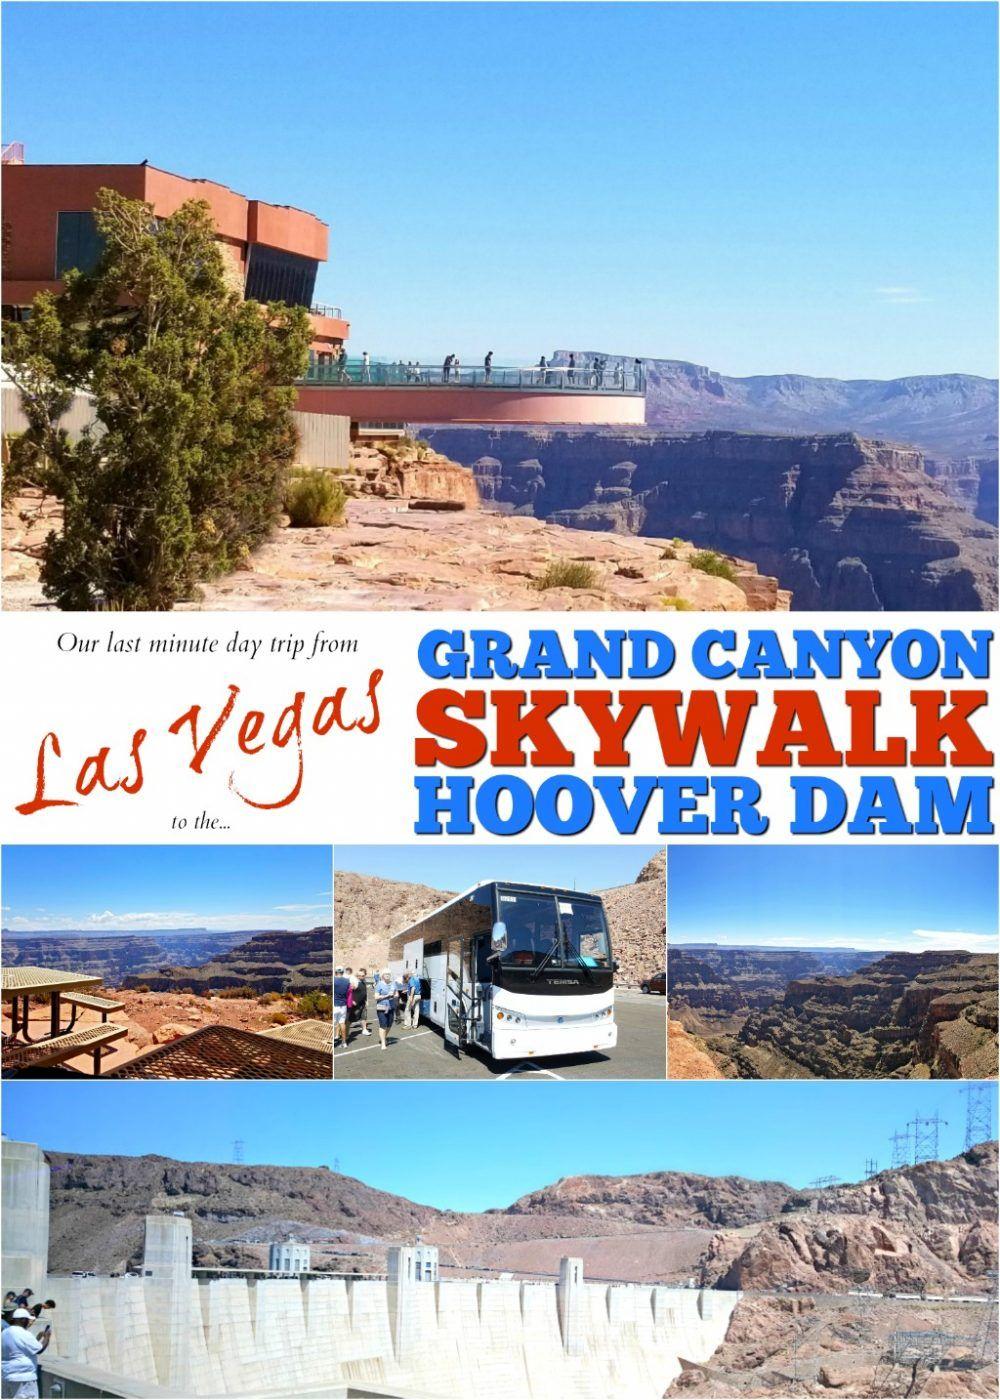 Grand Canyon Skywalk Hoover Dam From Las Vegas Las Vegas